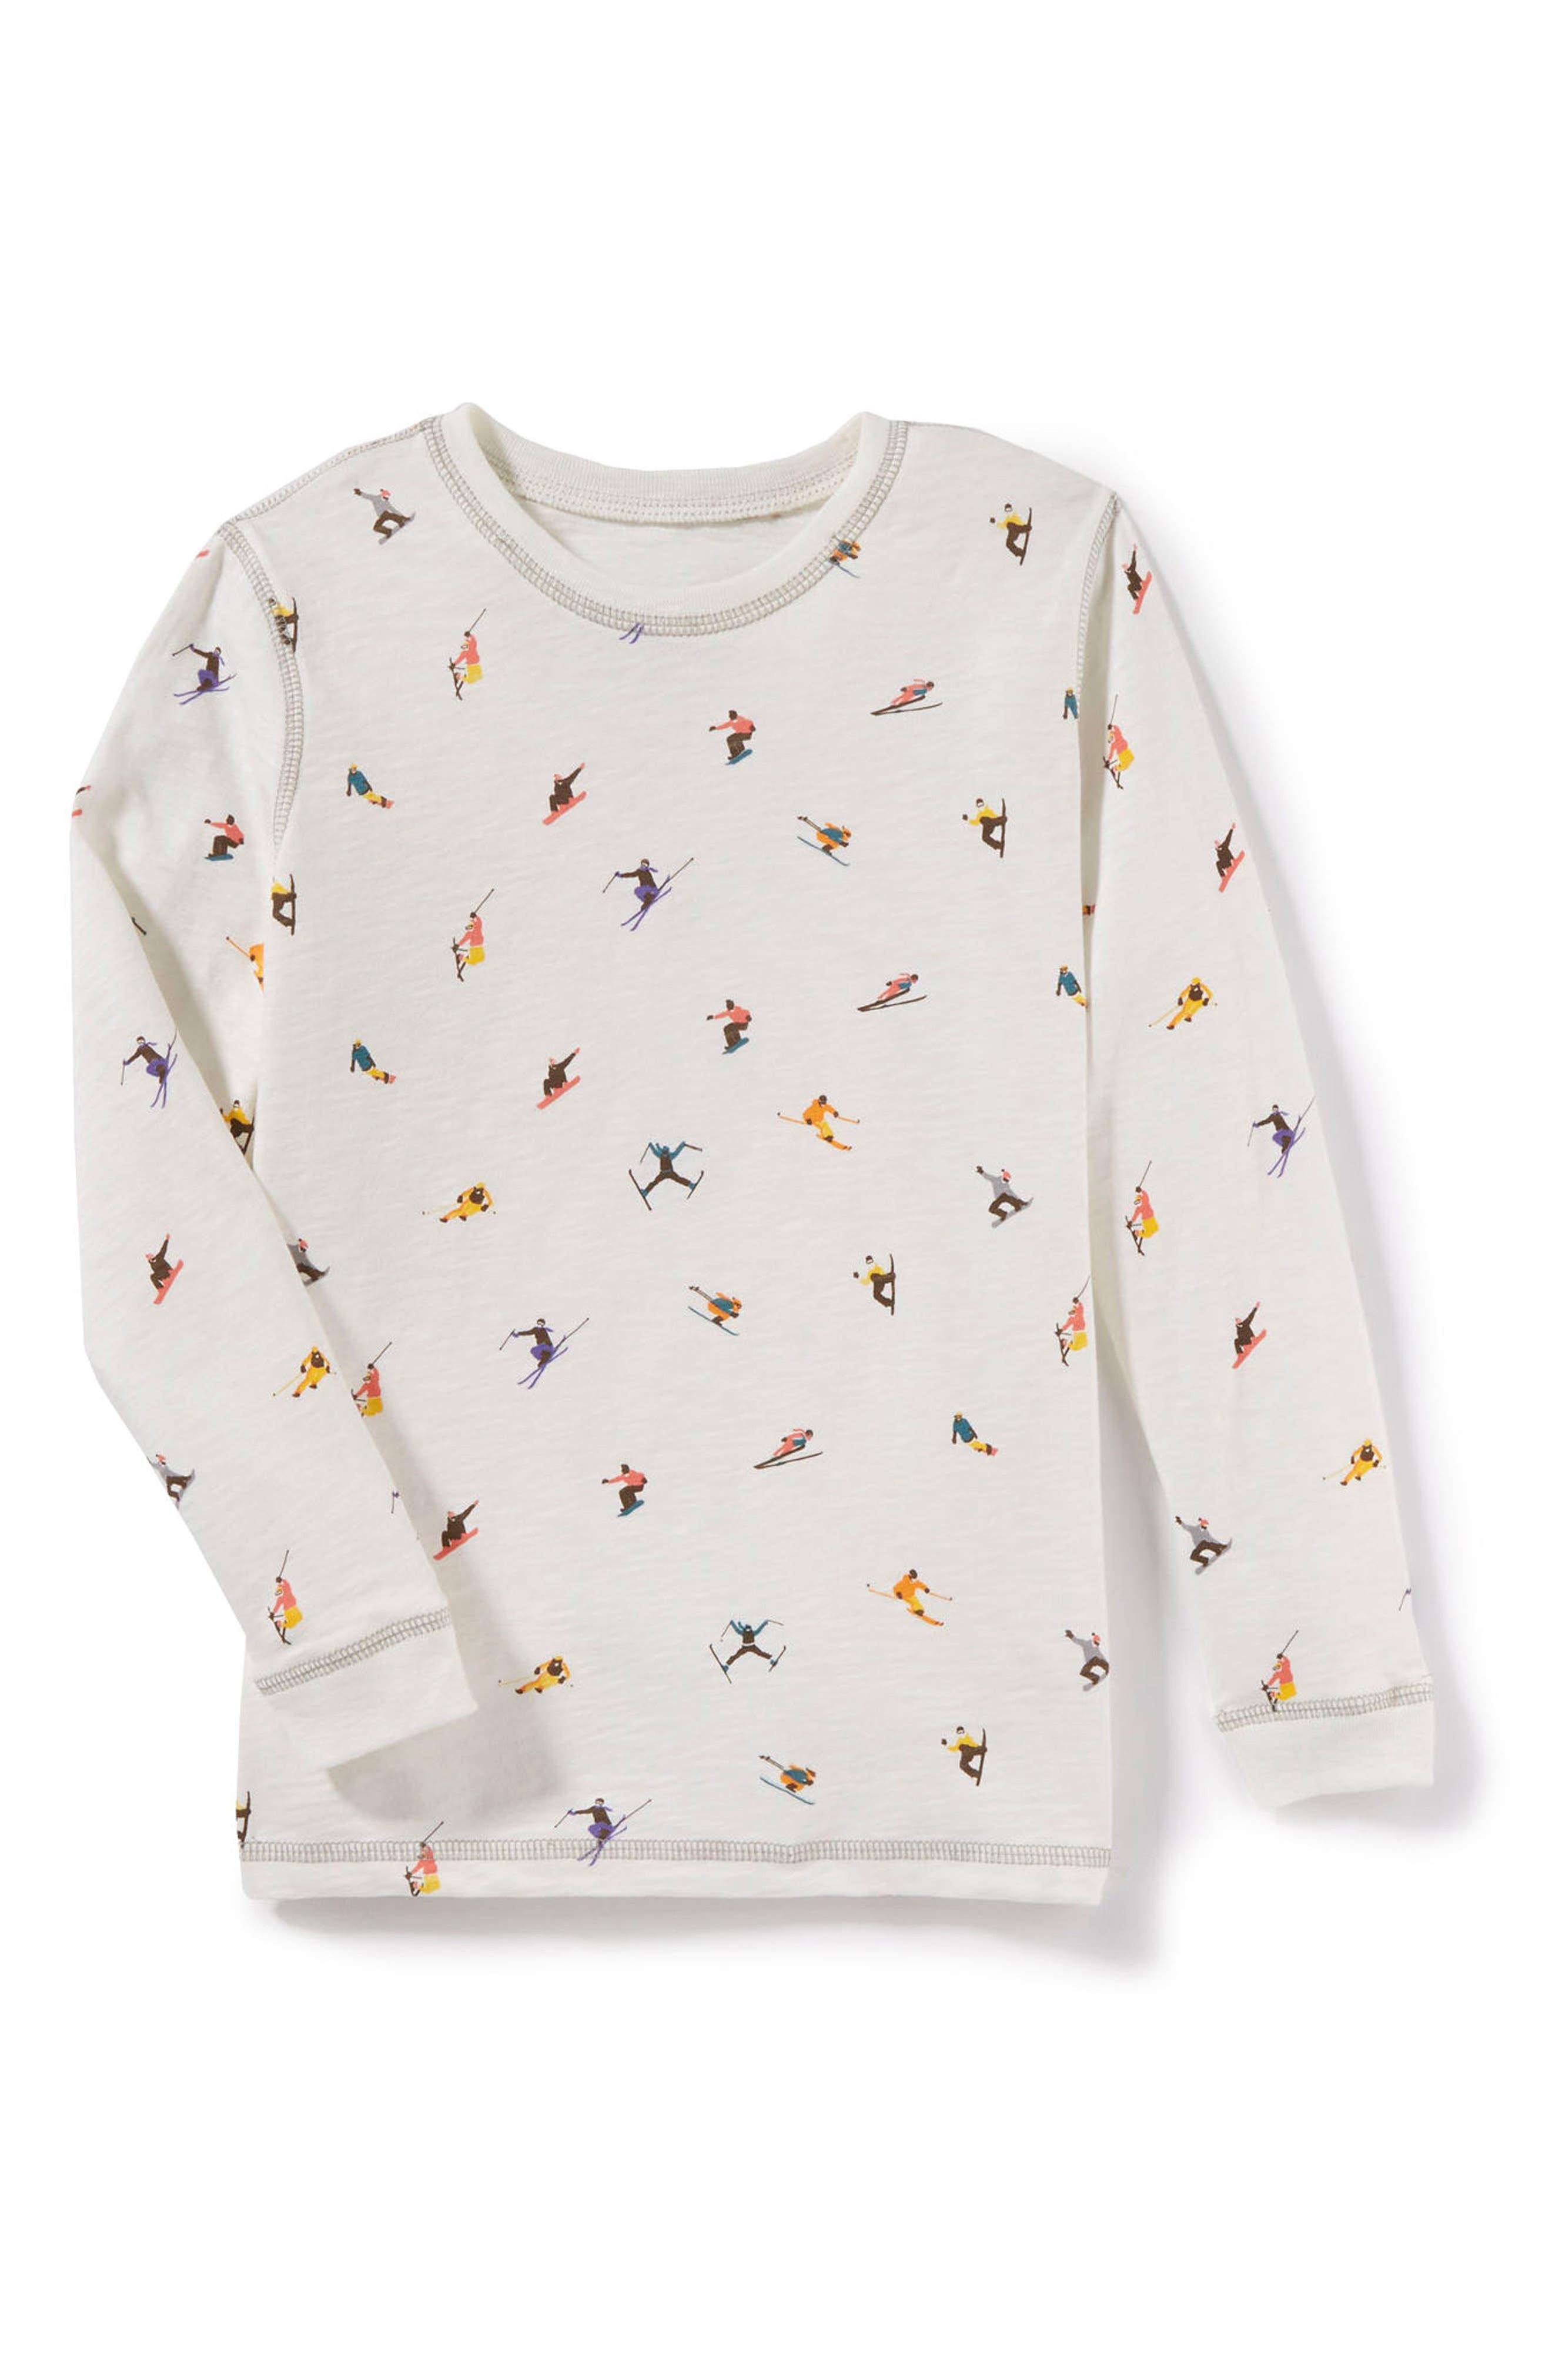 Alternate Image 1 Selected - Peek Ski Long Sleeve T-Shirt (Toddler Boys, Little Boys & Big Boys)